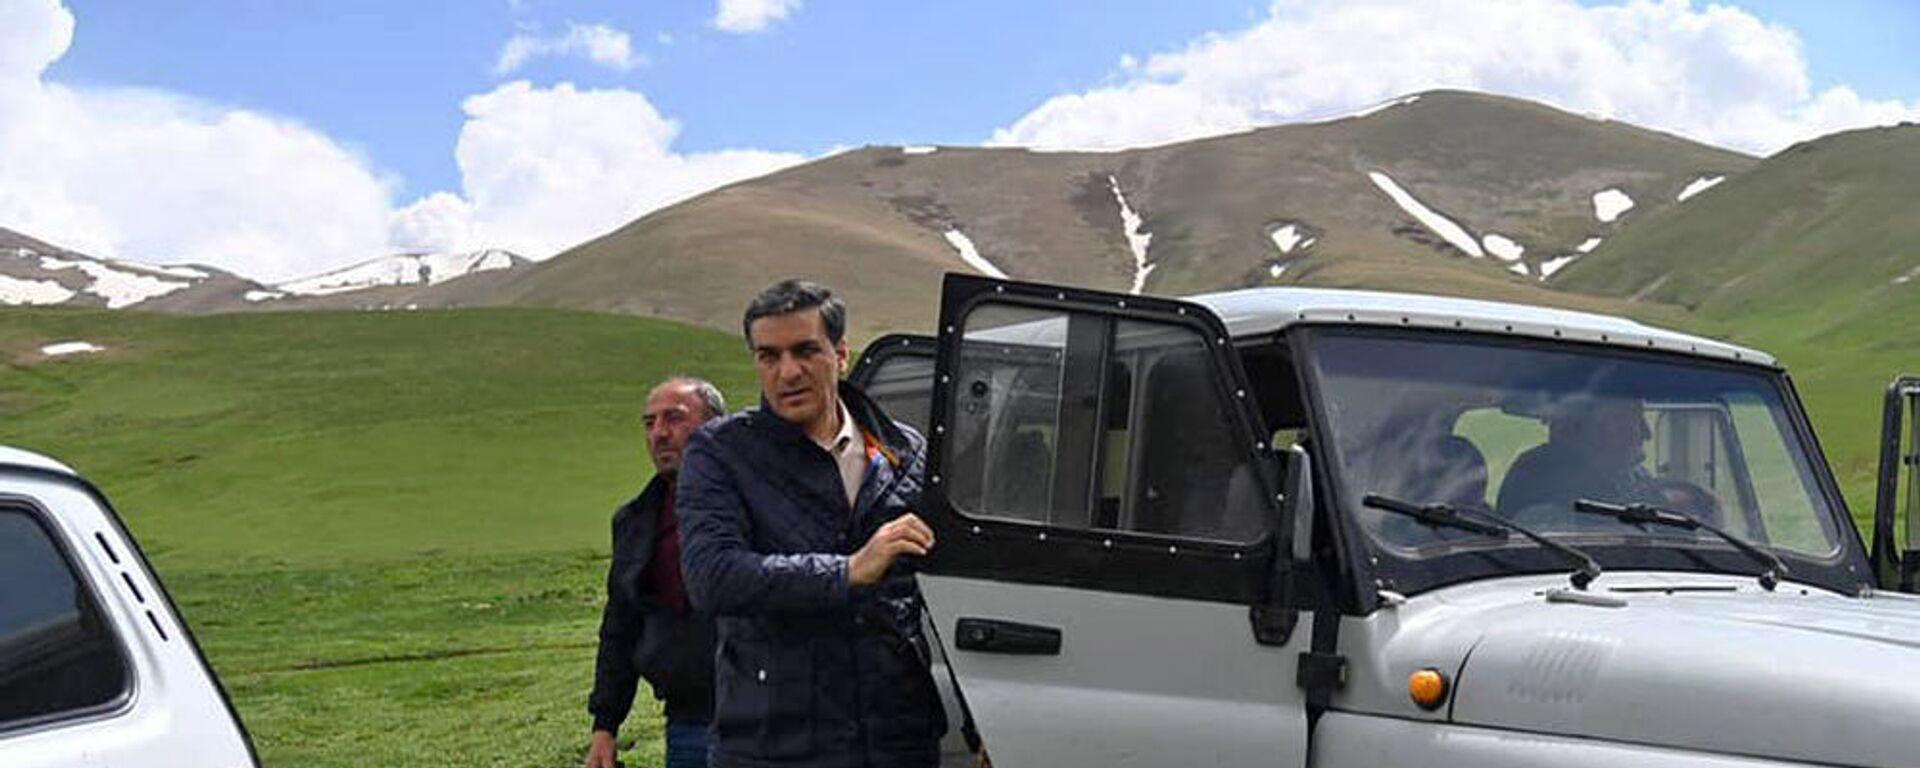 Омбудсмен Арман Татоян посетил с рабочим визитом Гегаркуникскую область (15 мая 2021). Гегаркуник - Sputnik Армения, 1920, 10.06.2021